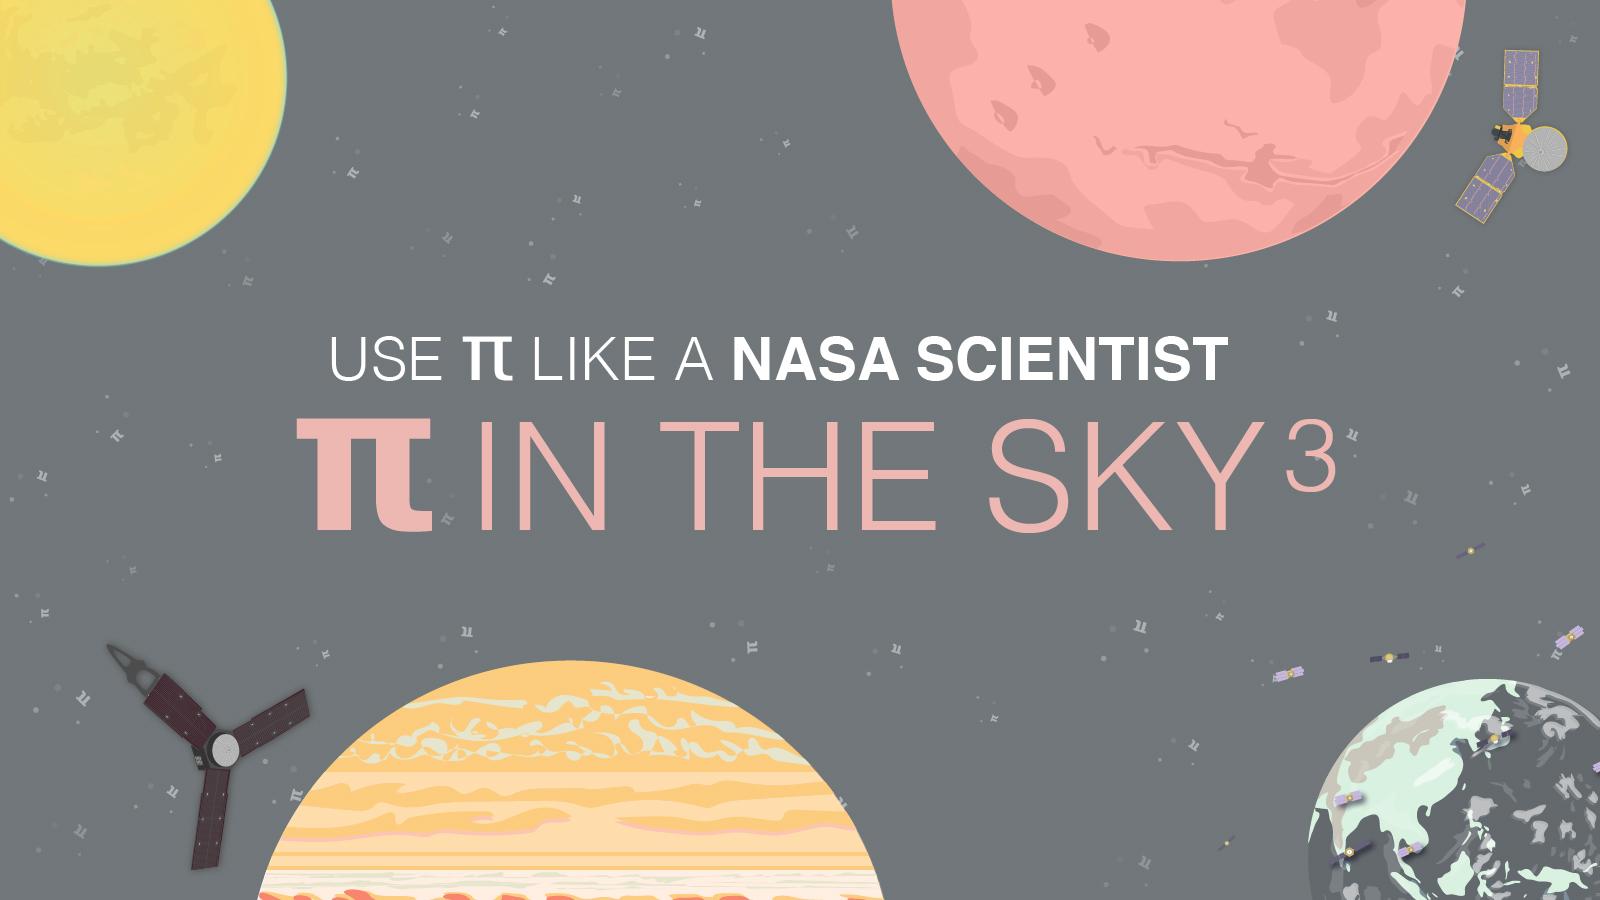 Pi in the Sky 3 Activity | NASA/JPL Edu